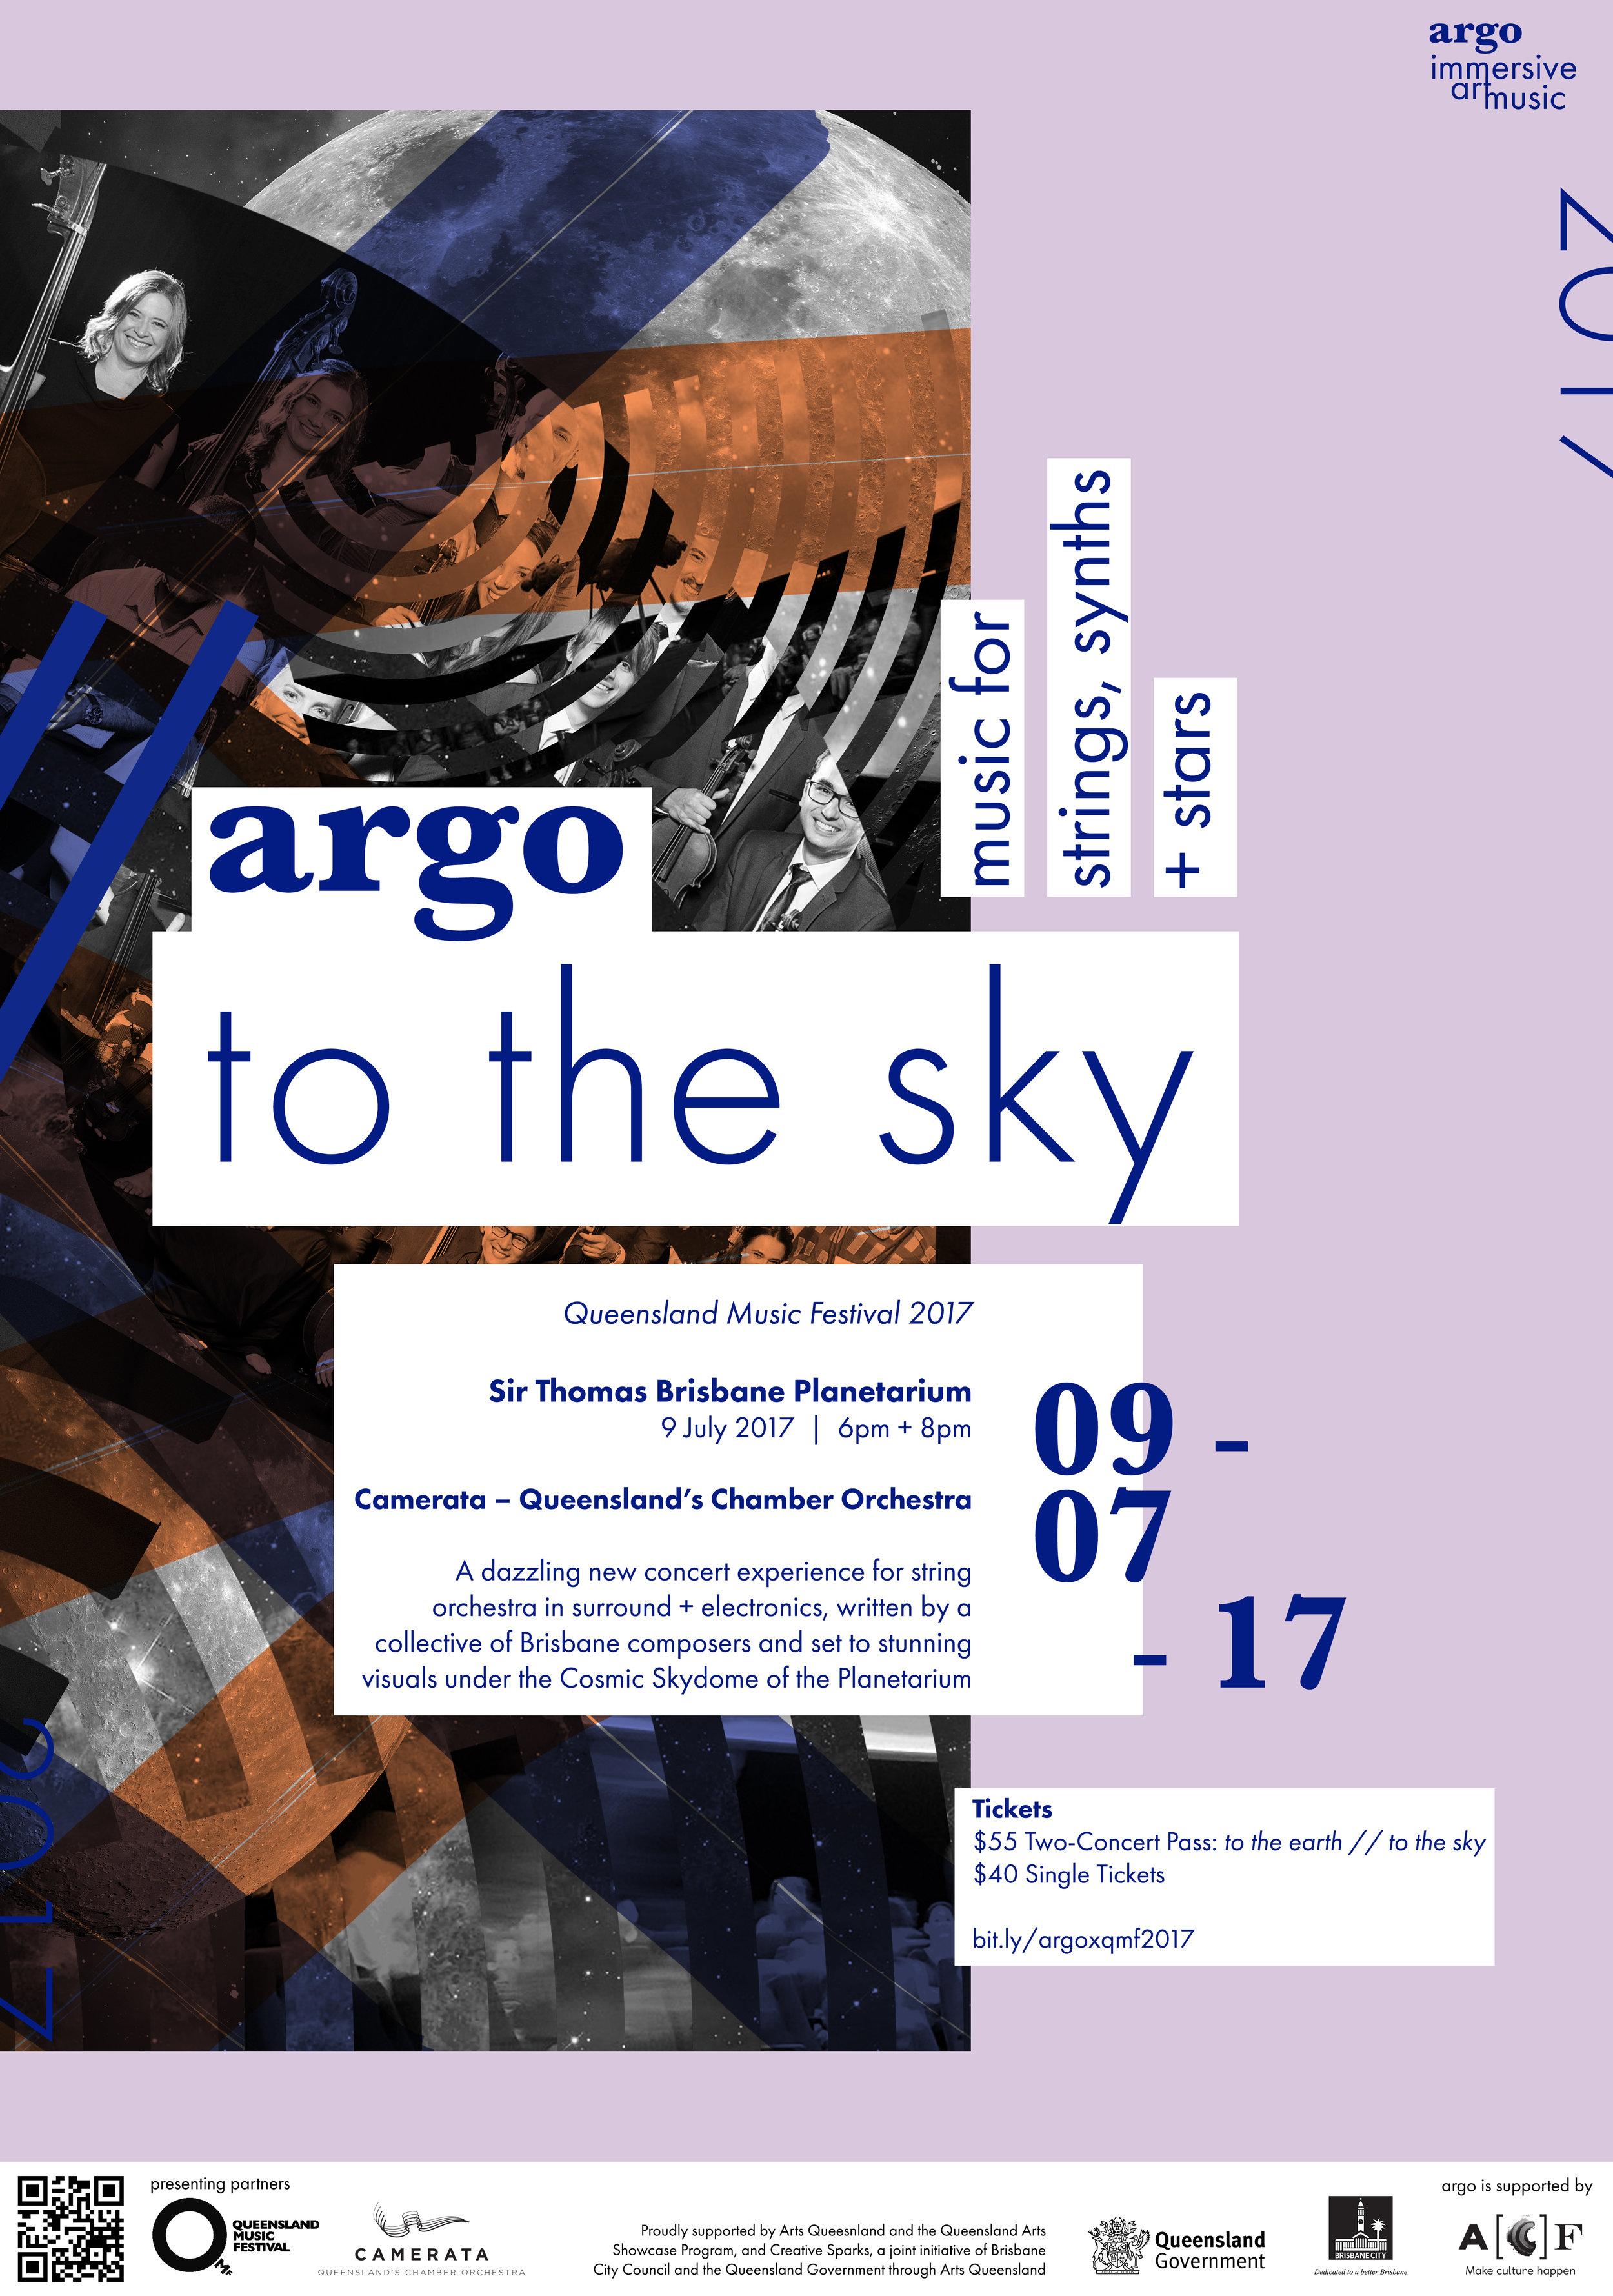 Argo_3_TO THE SKY-Poster.jpg